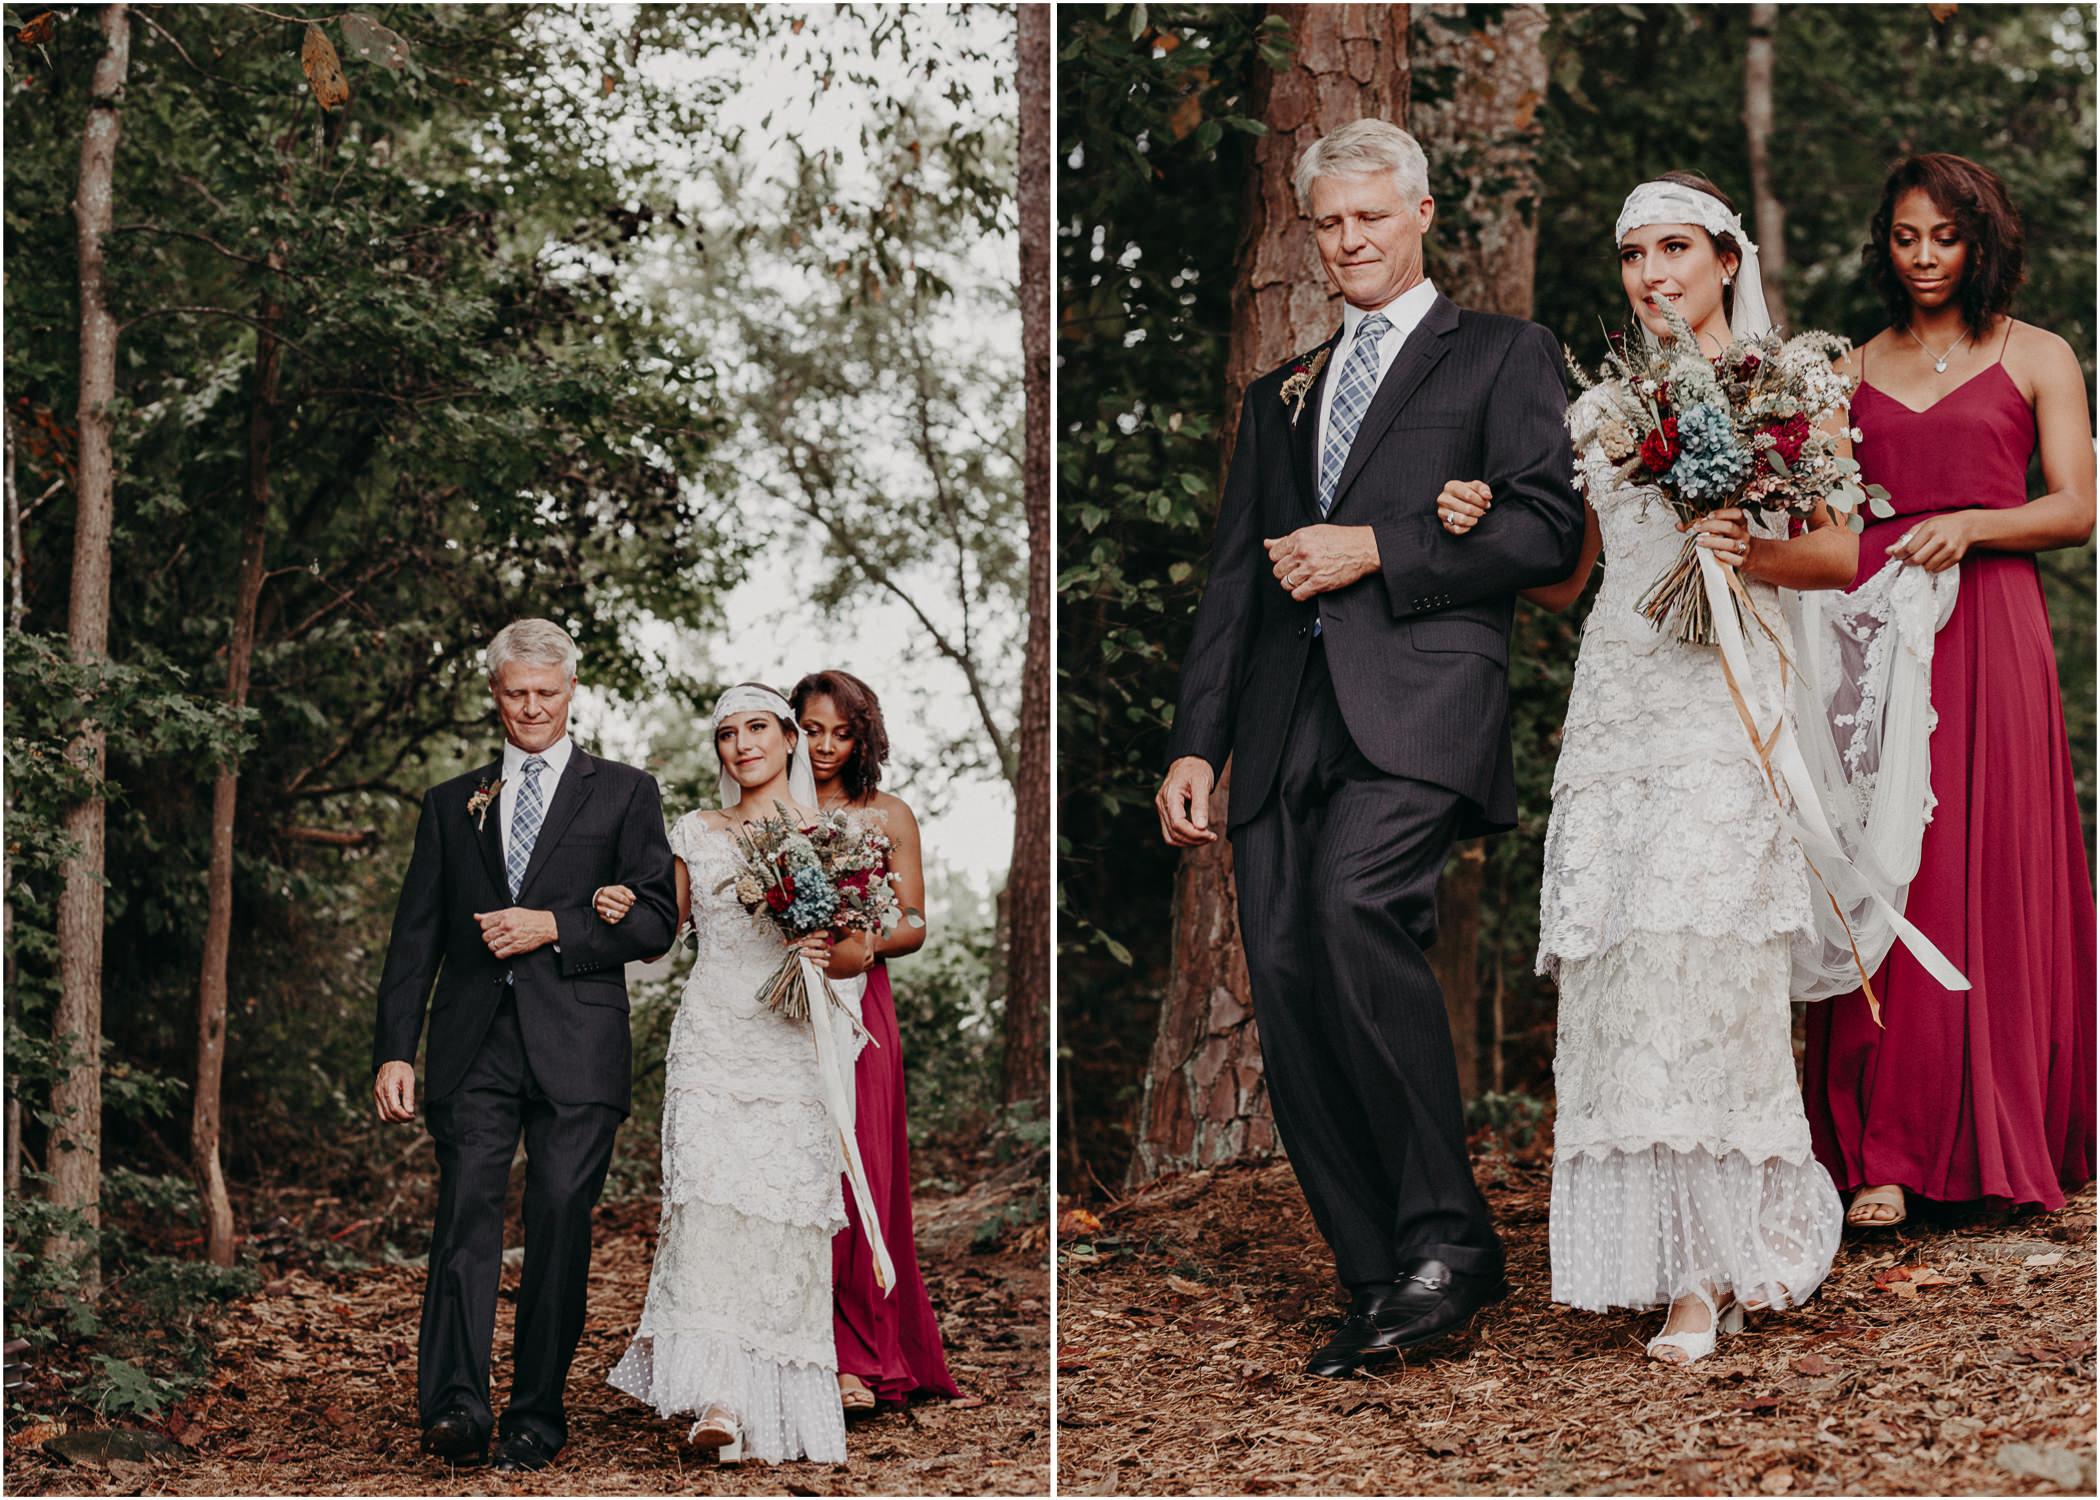 94 - Bride walking down the aisle -  Wedding Ceremony - Destination Wedding : Beach : Lake Wedding Atlanta Wedding Photographer .jpg